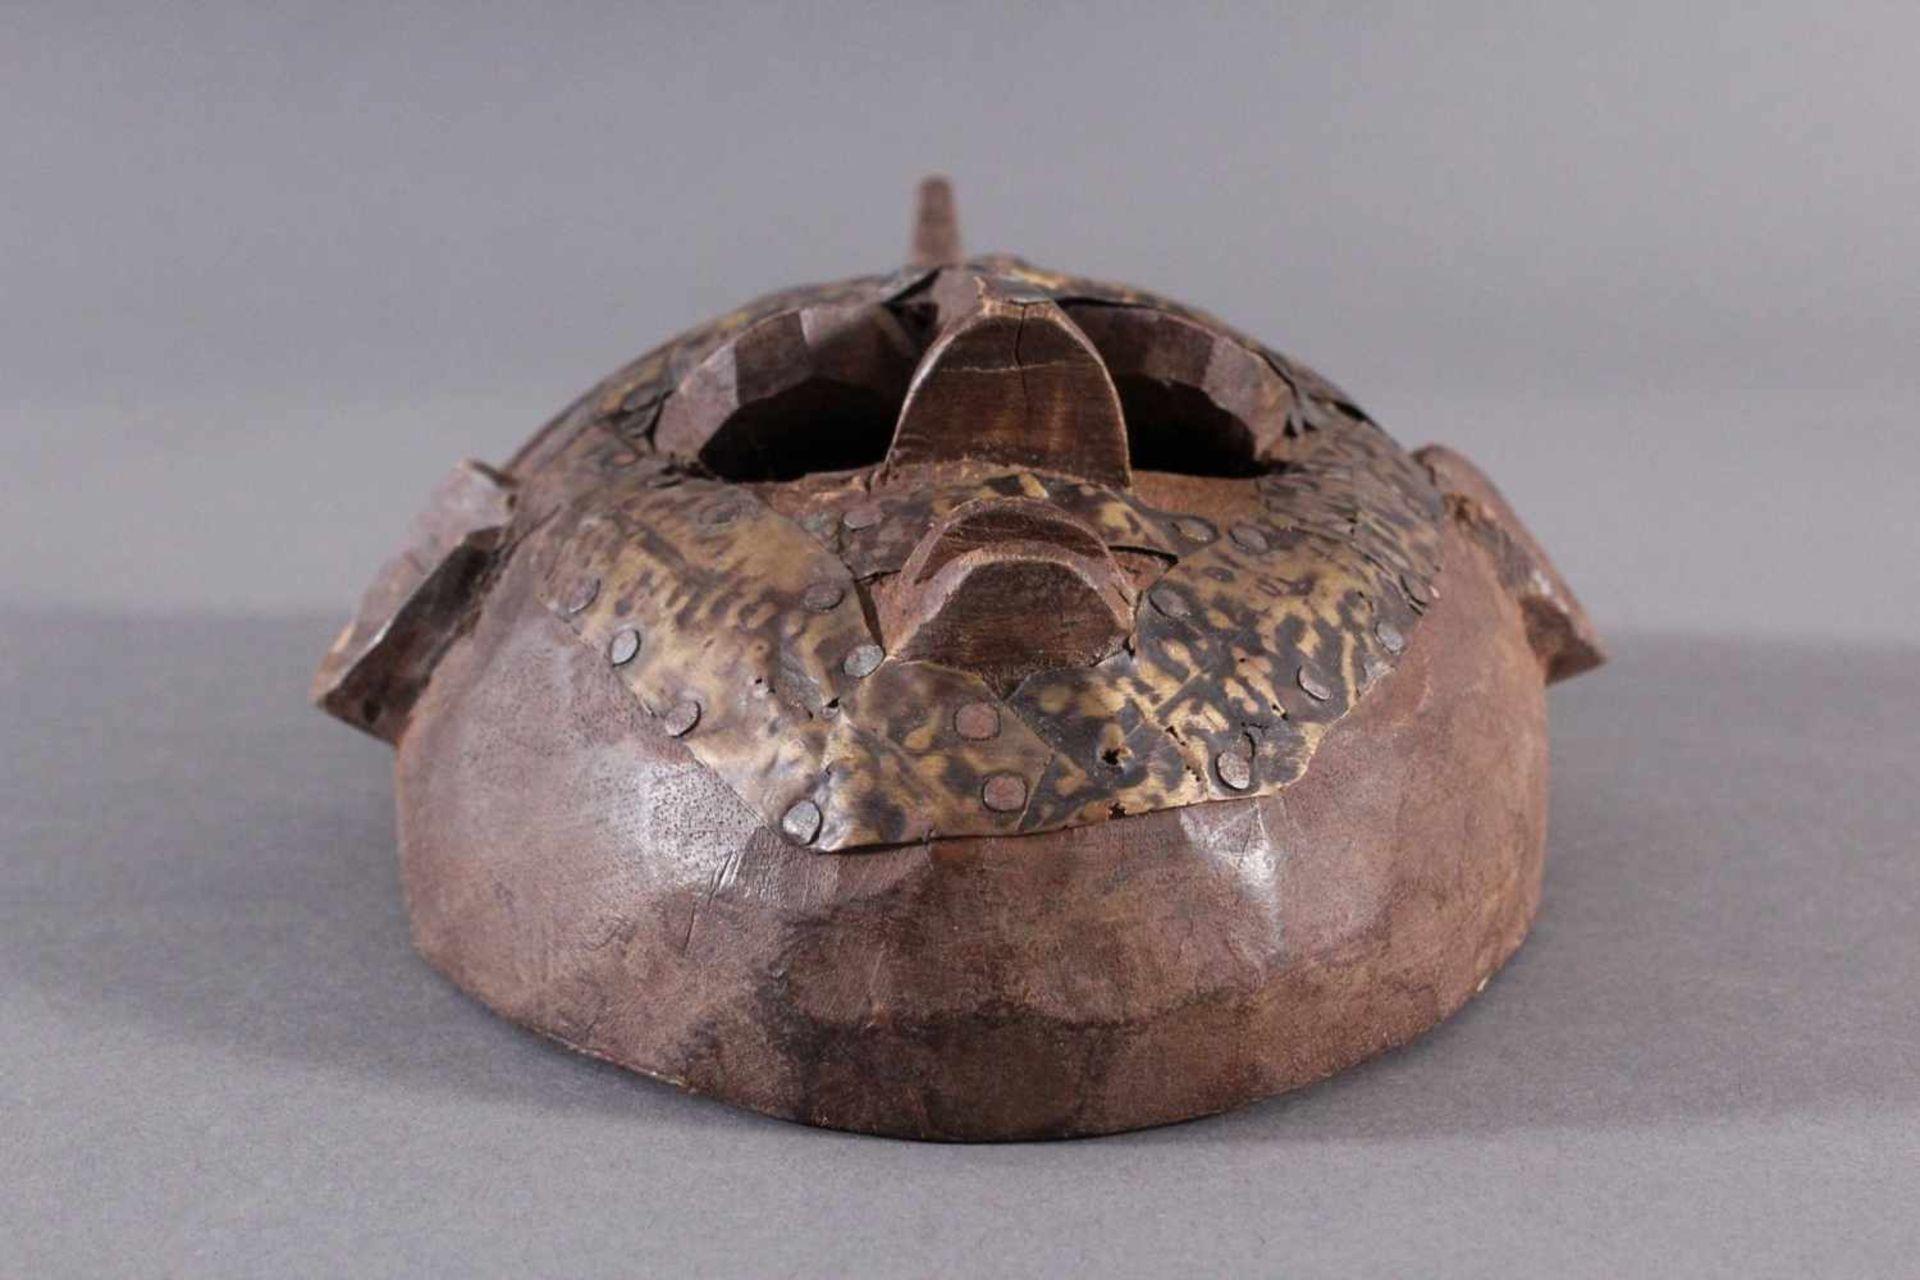 Antike Maske, Marka, Mali 1.Hälfte 19. Jh.Holz geschnitzt, Gesicht stzellenweise mit Messing-Blech - Bild 2 aus 6